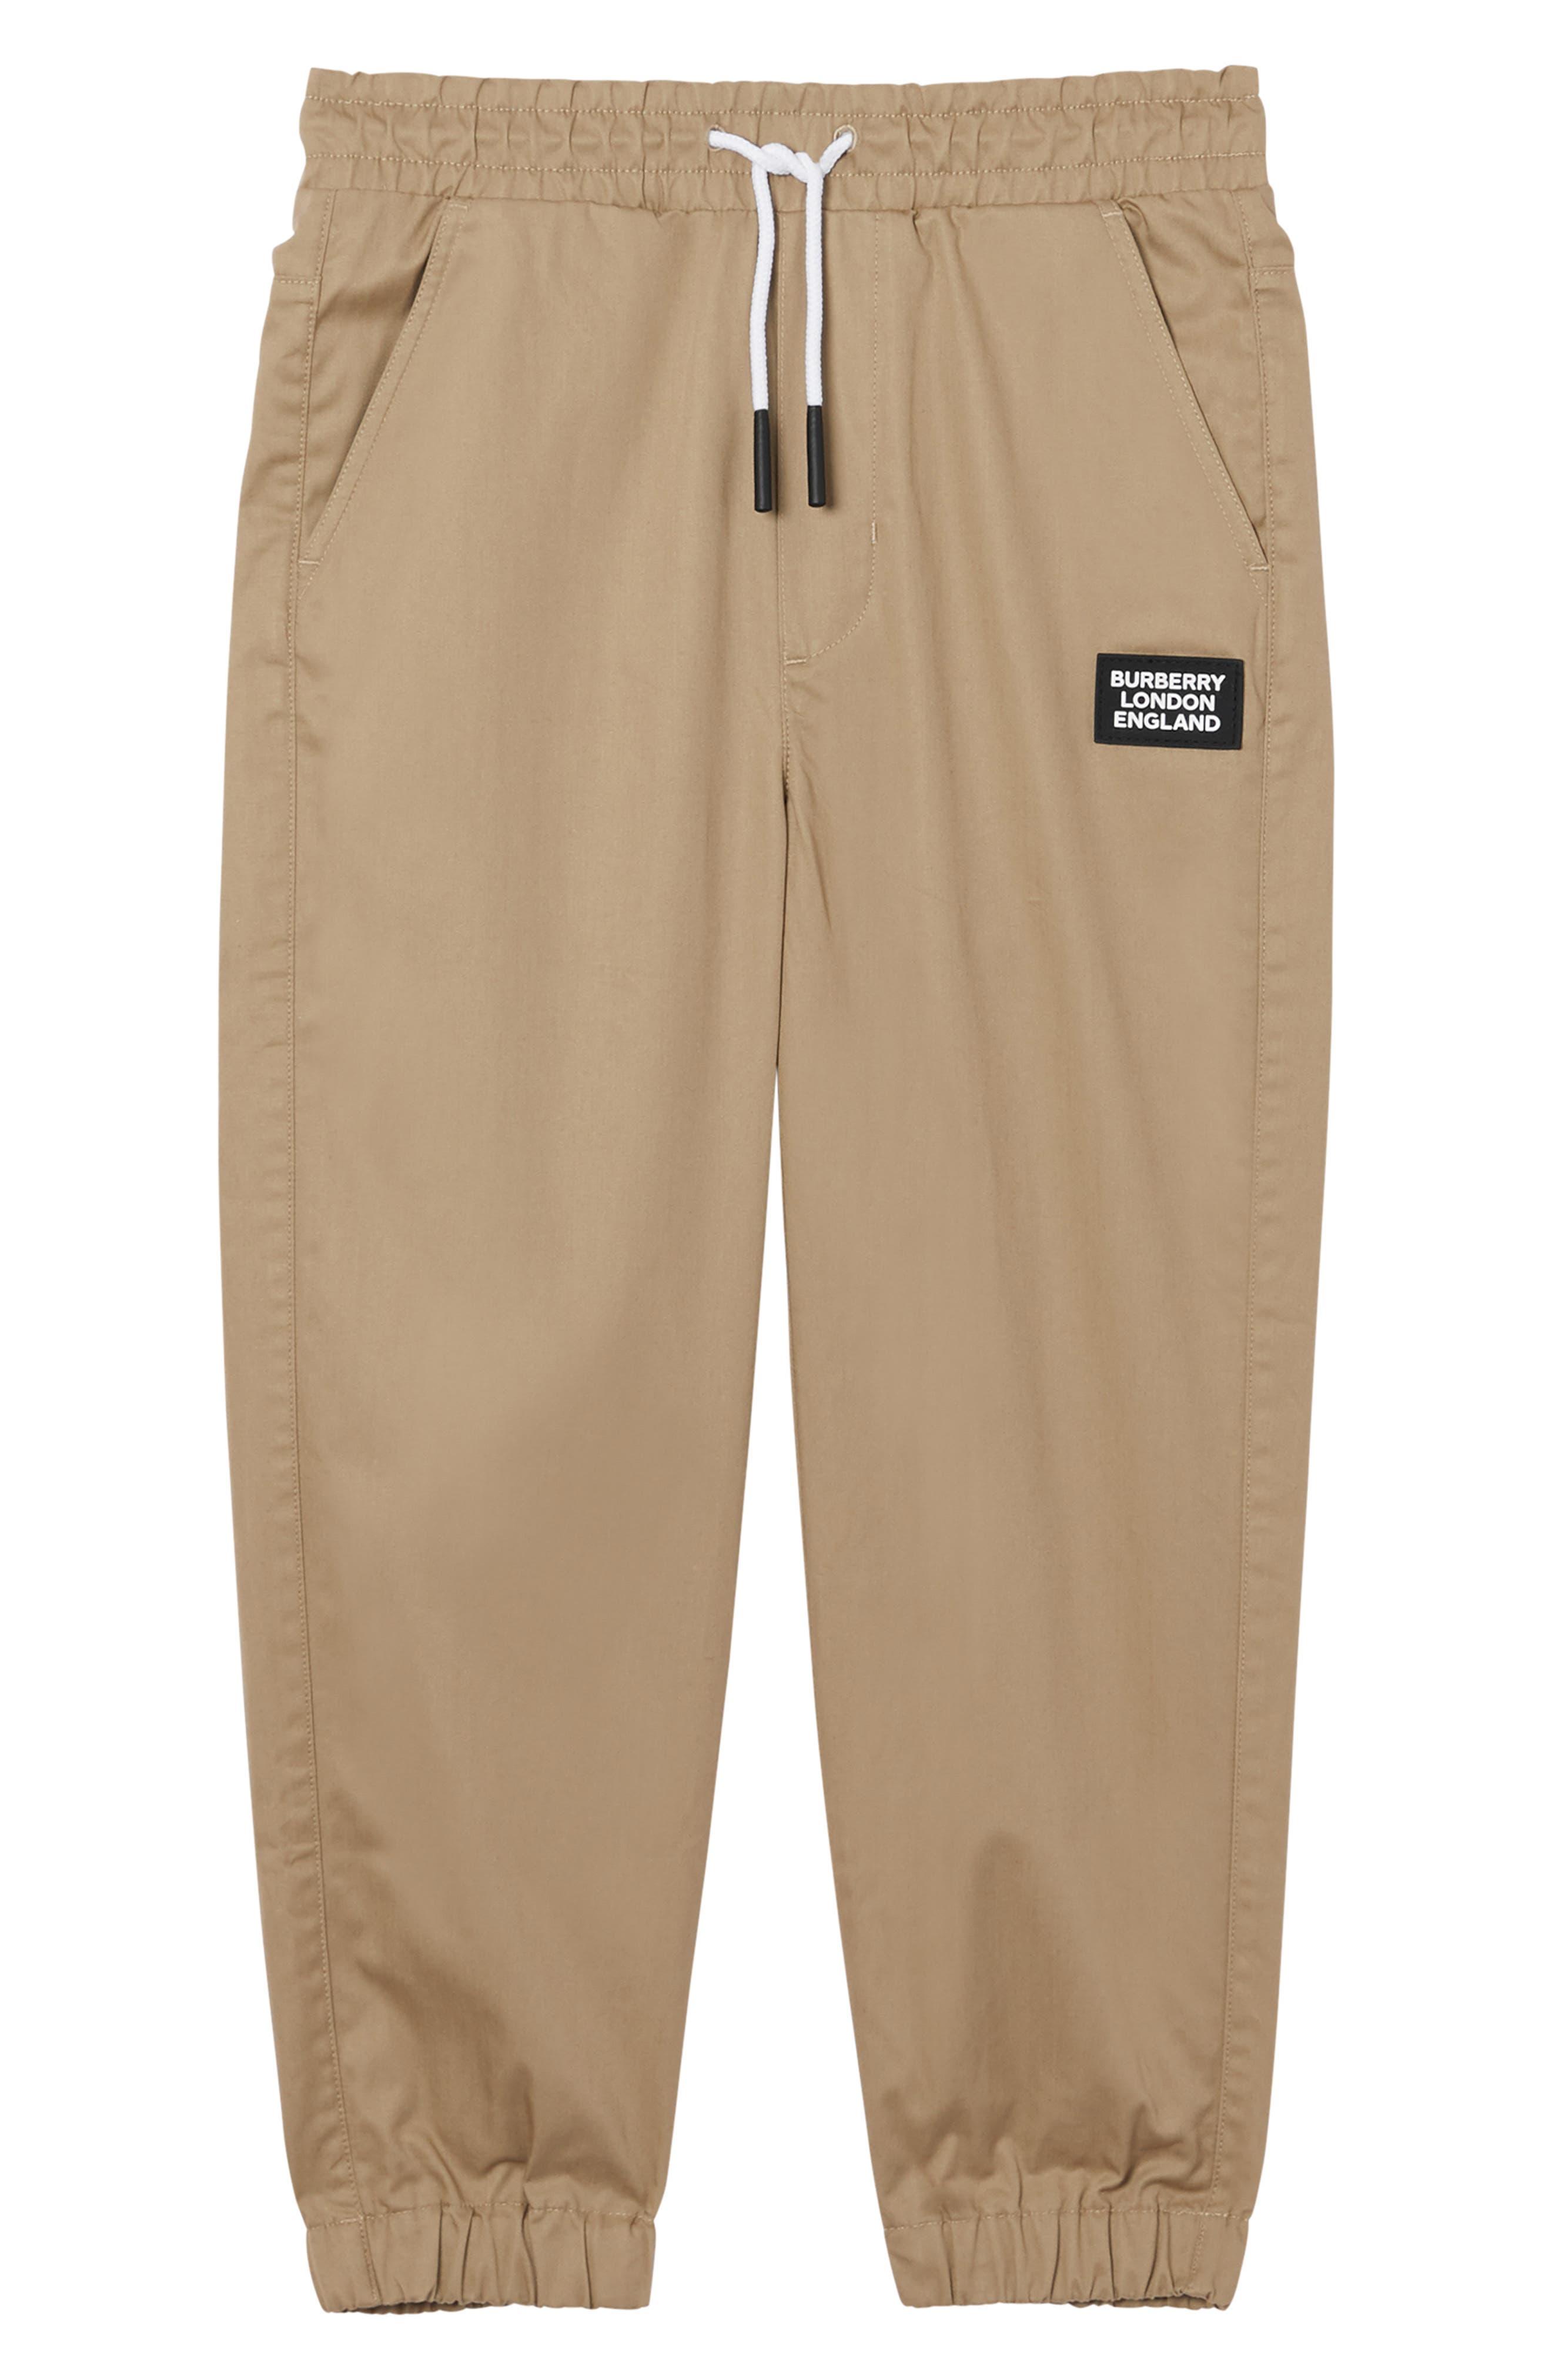 adidas Trefoil Heather Gray Boys Sweat Shorts